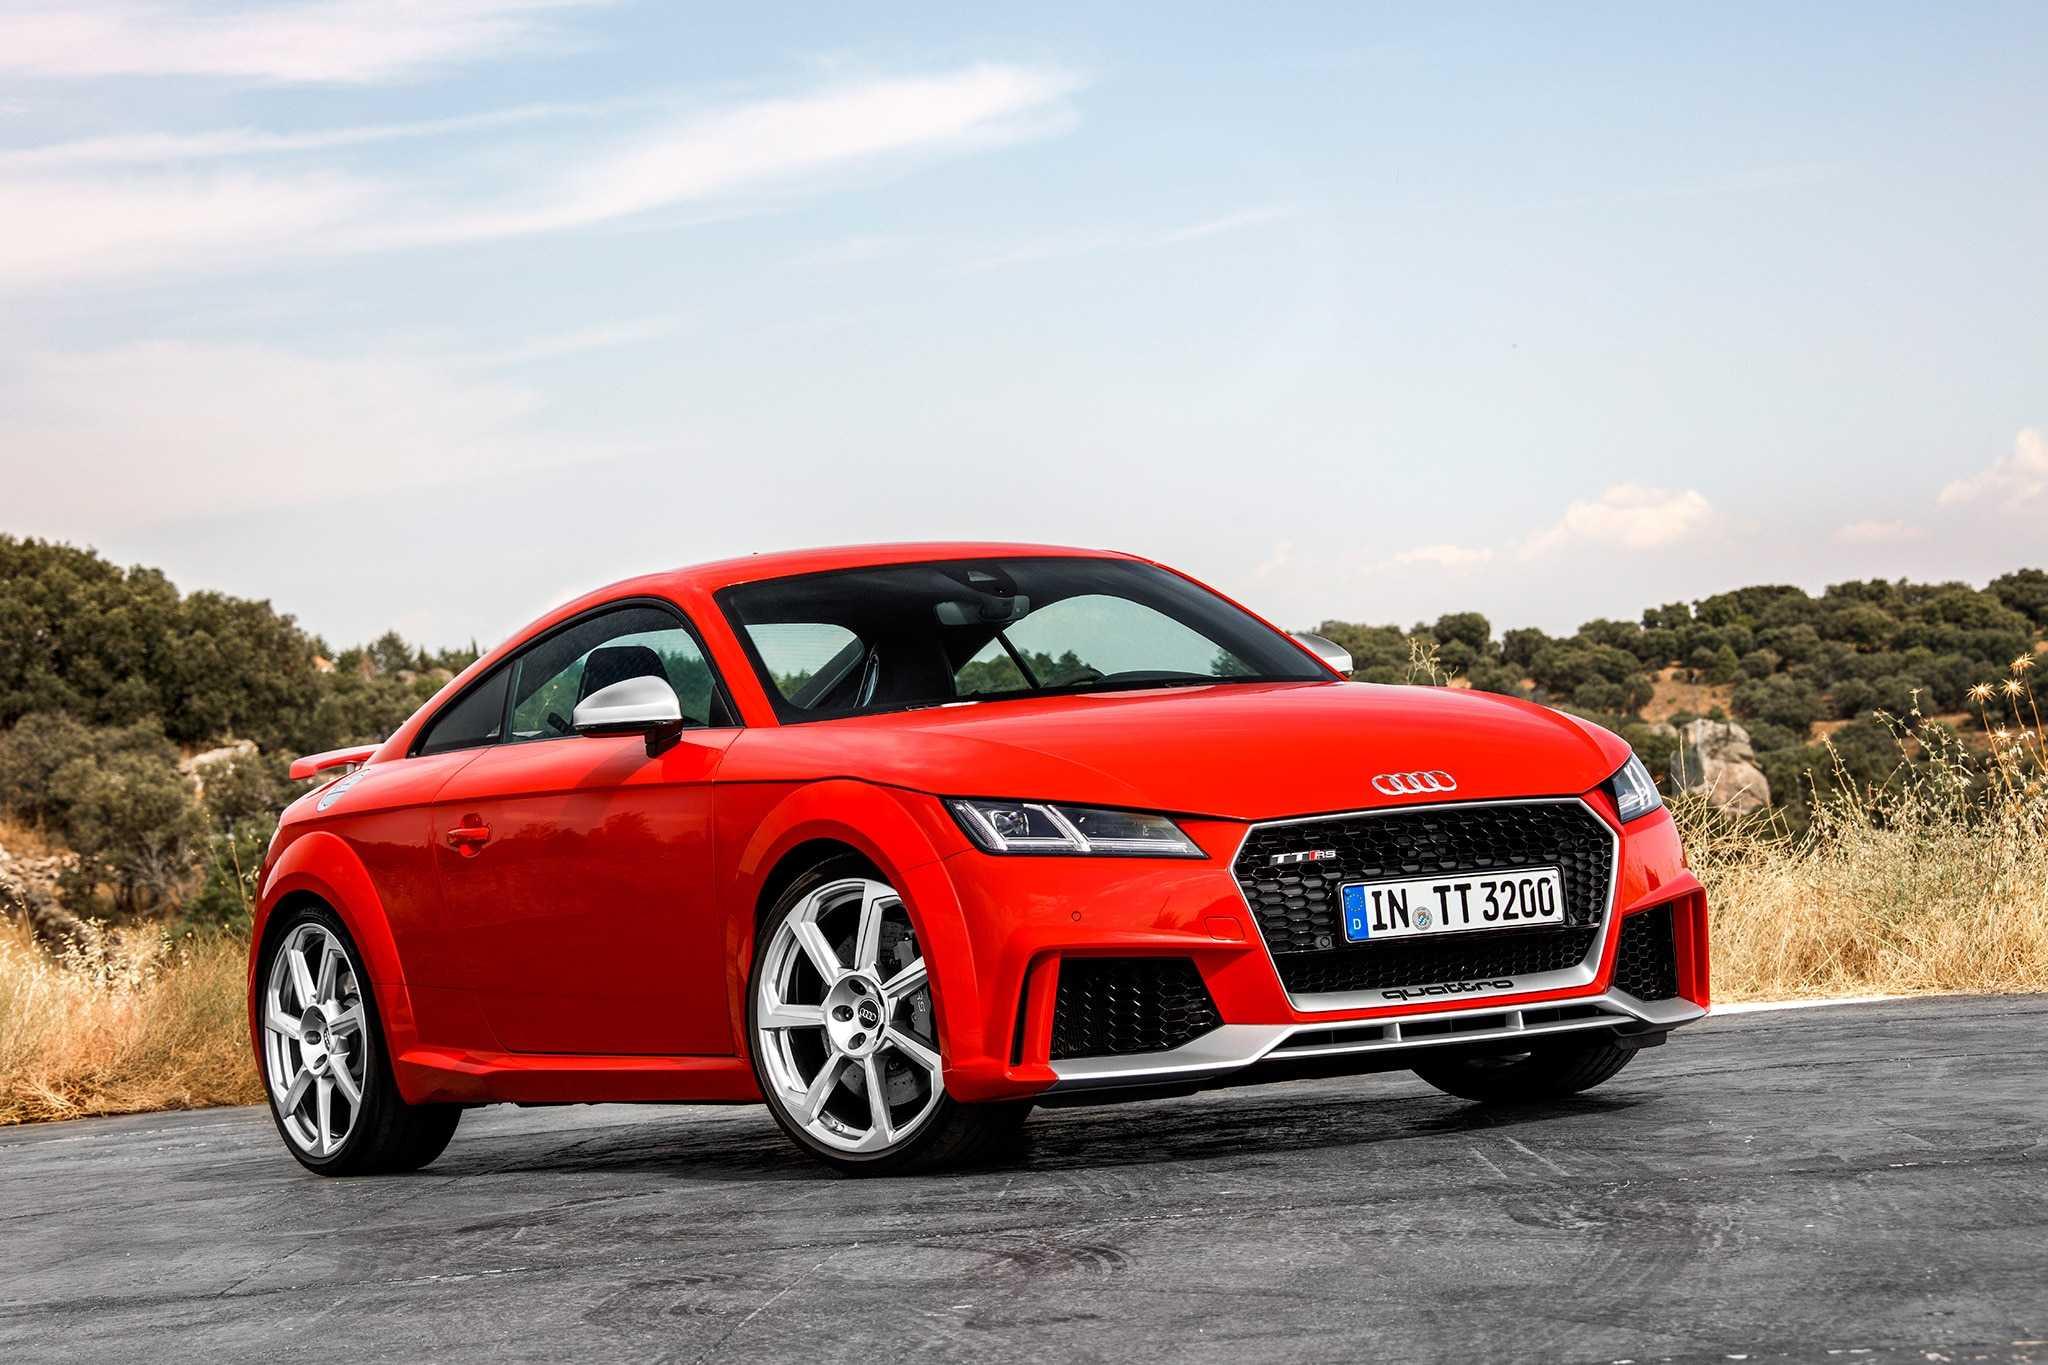 Audi tt - характеристики, комплектации, фото, видео, обзор